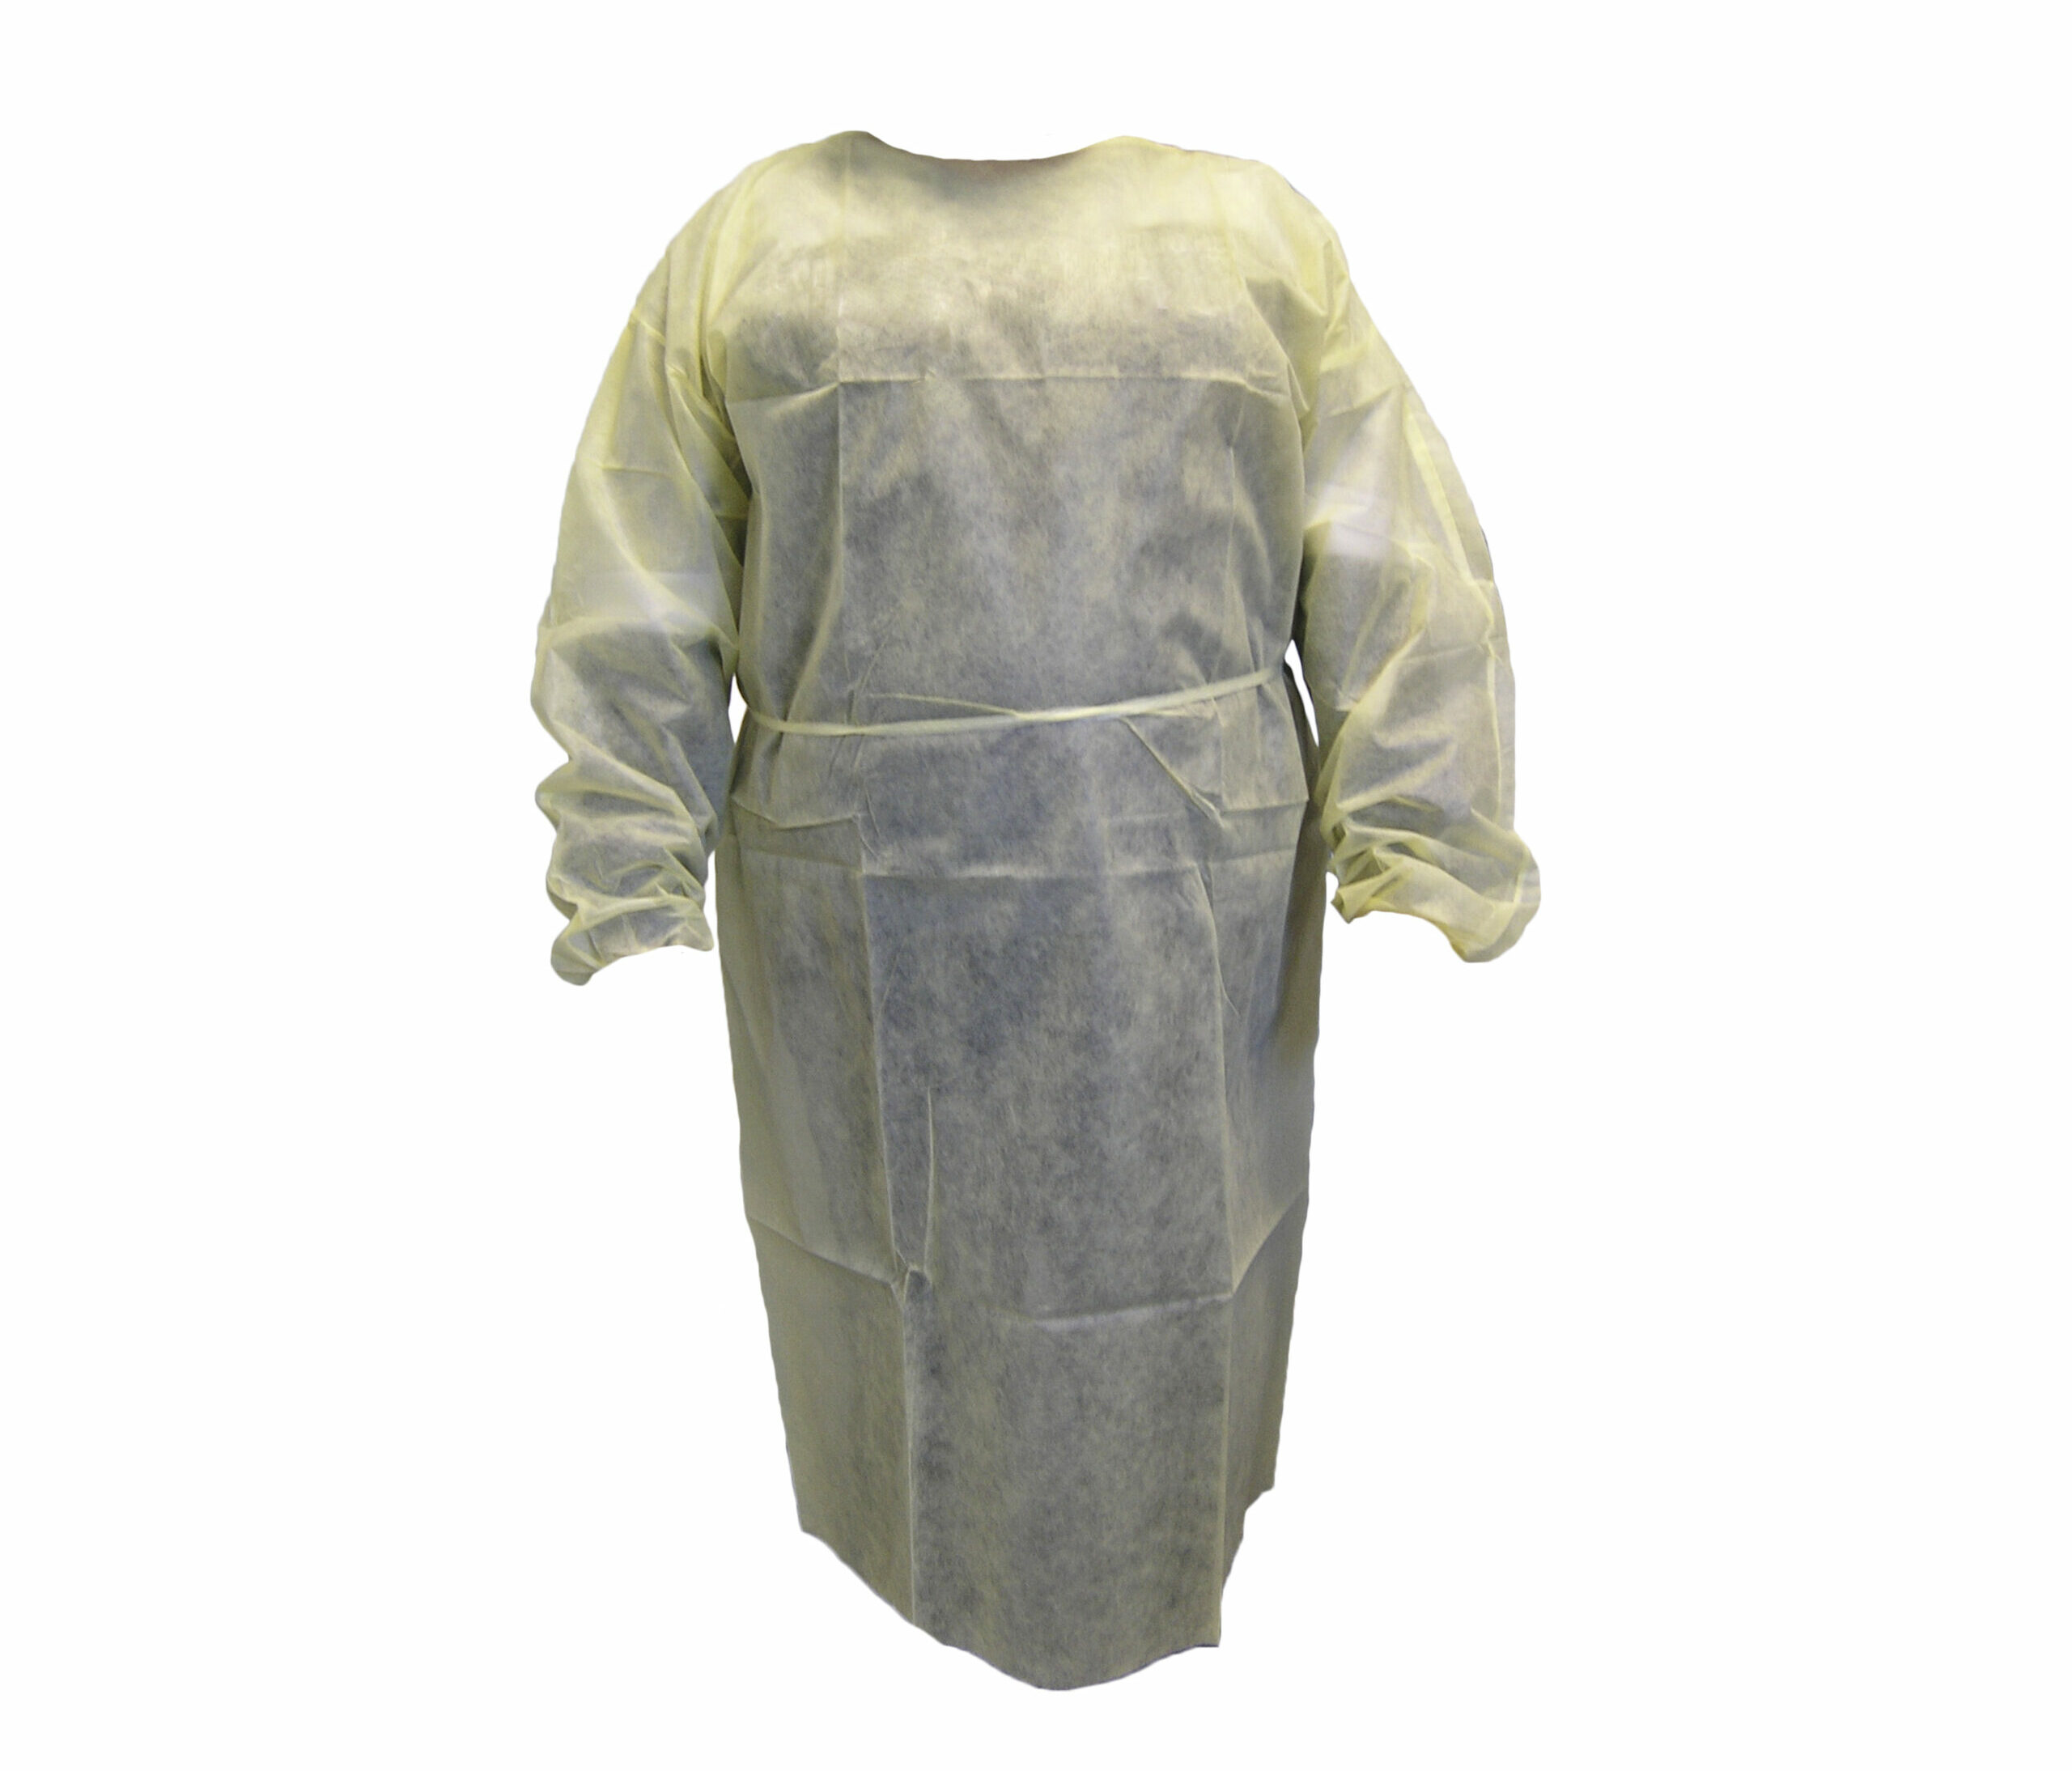 py-g-xl-yellow-polyproylene-isolation-gown